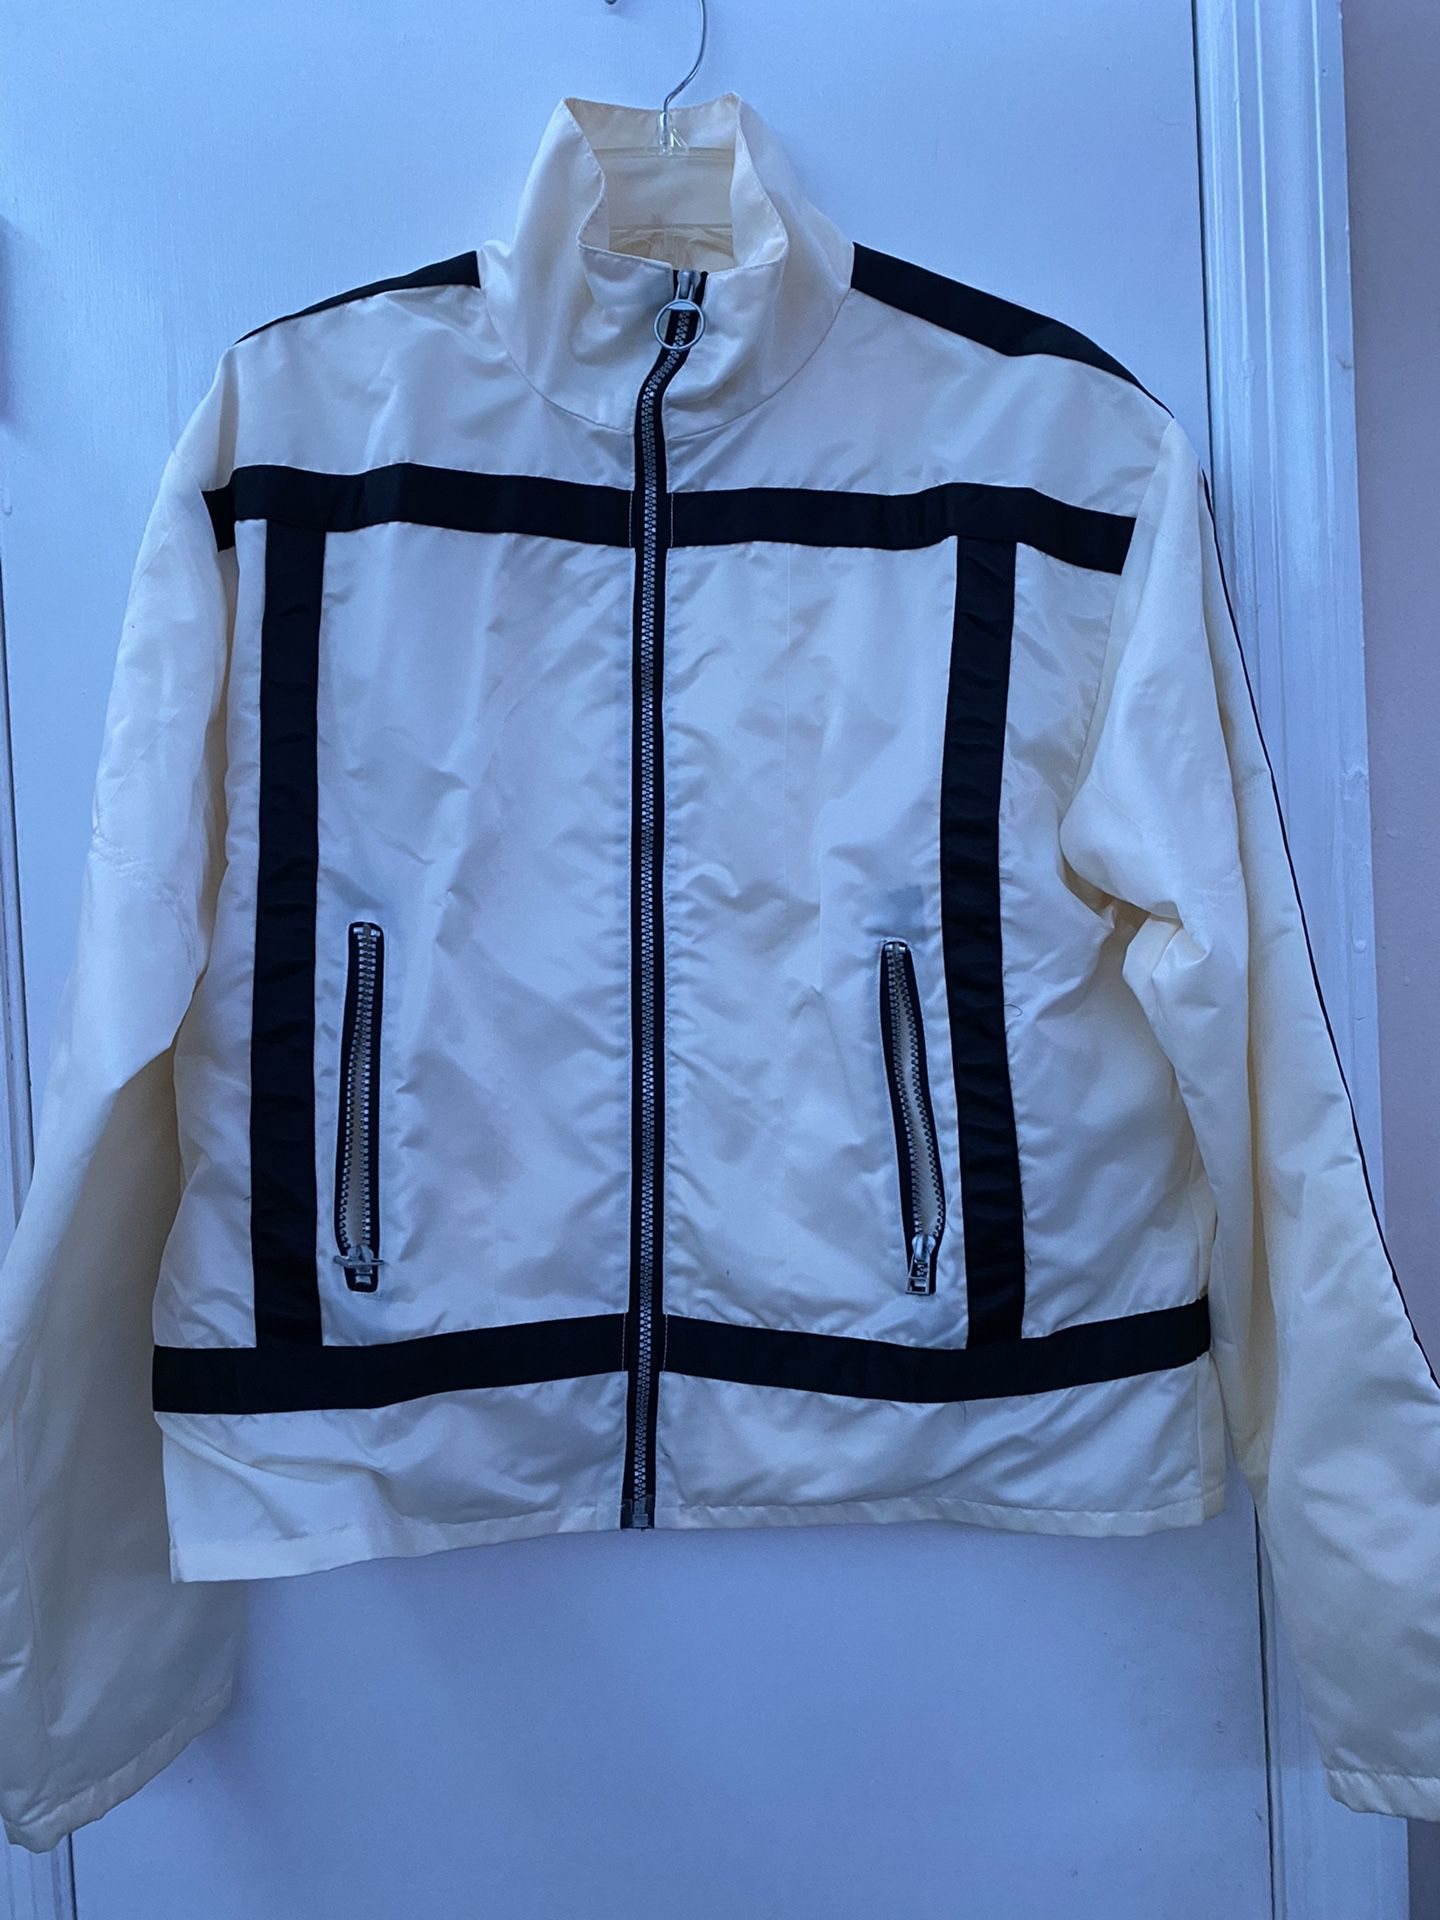 White Biker Look-a-like Jacket